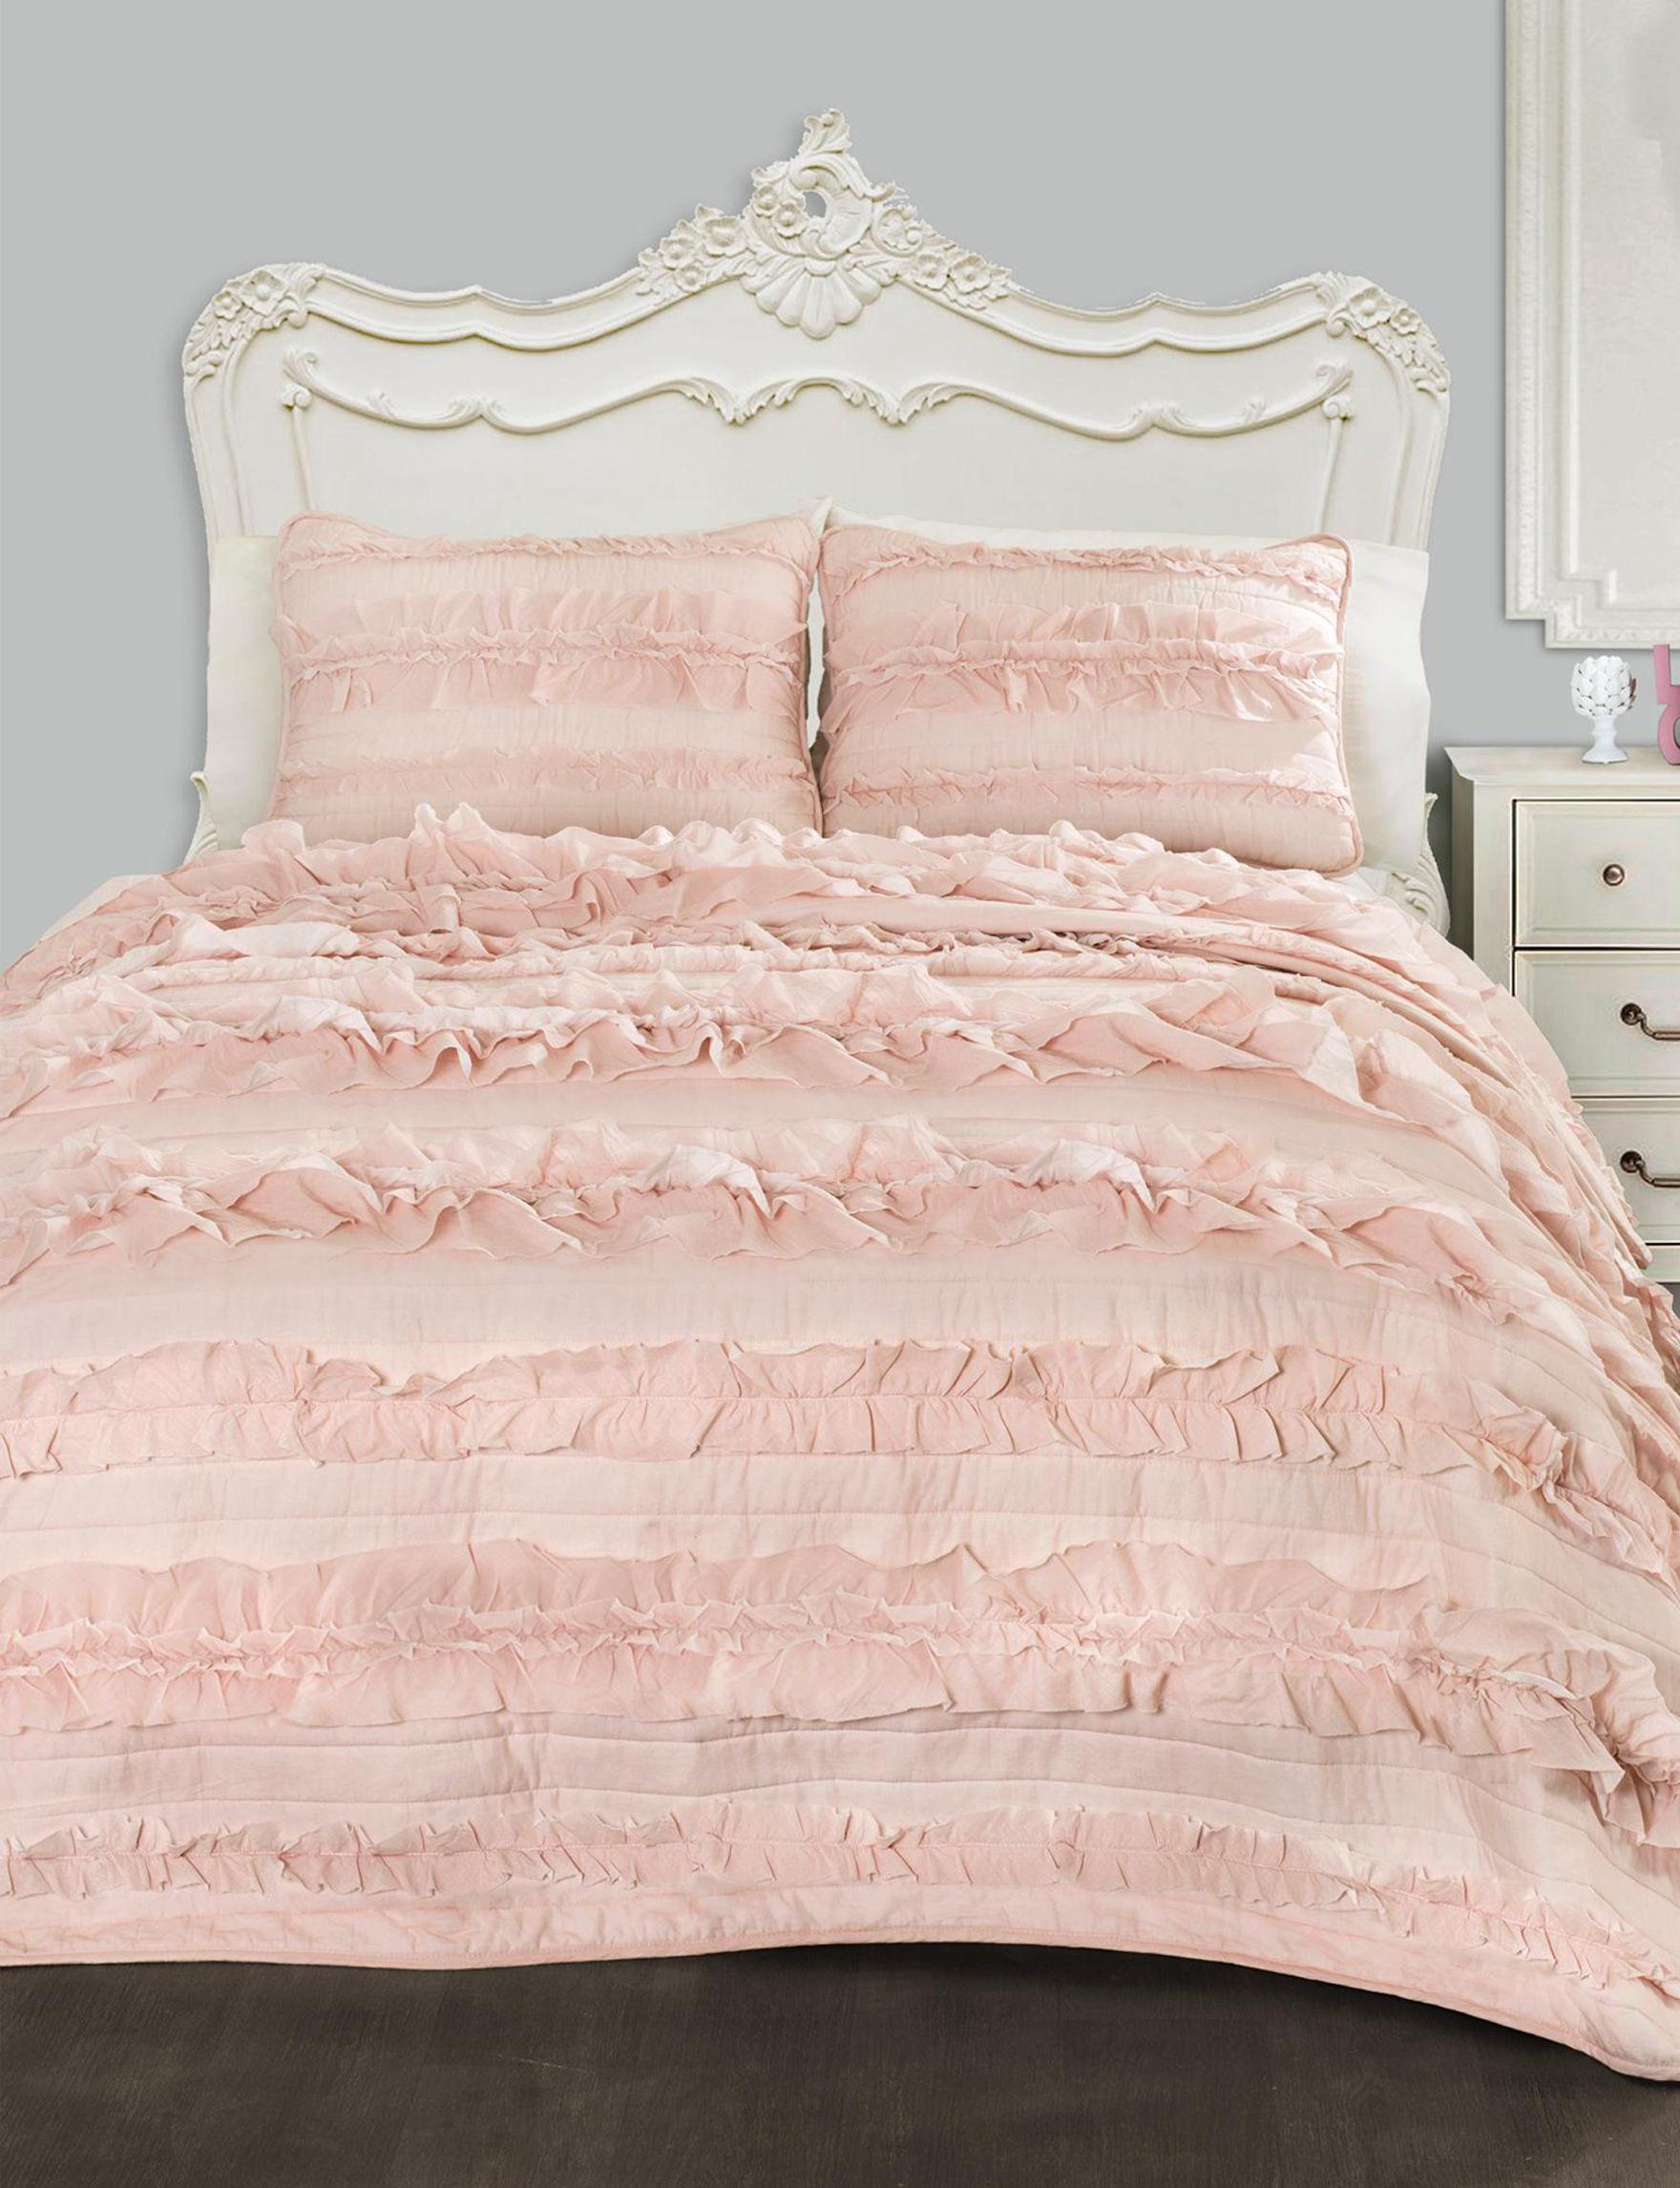 Lush Decor Pink Quilts & Quilt Sets